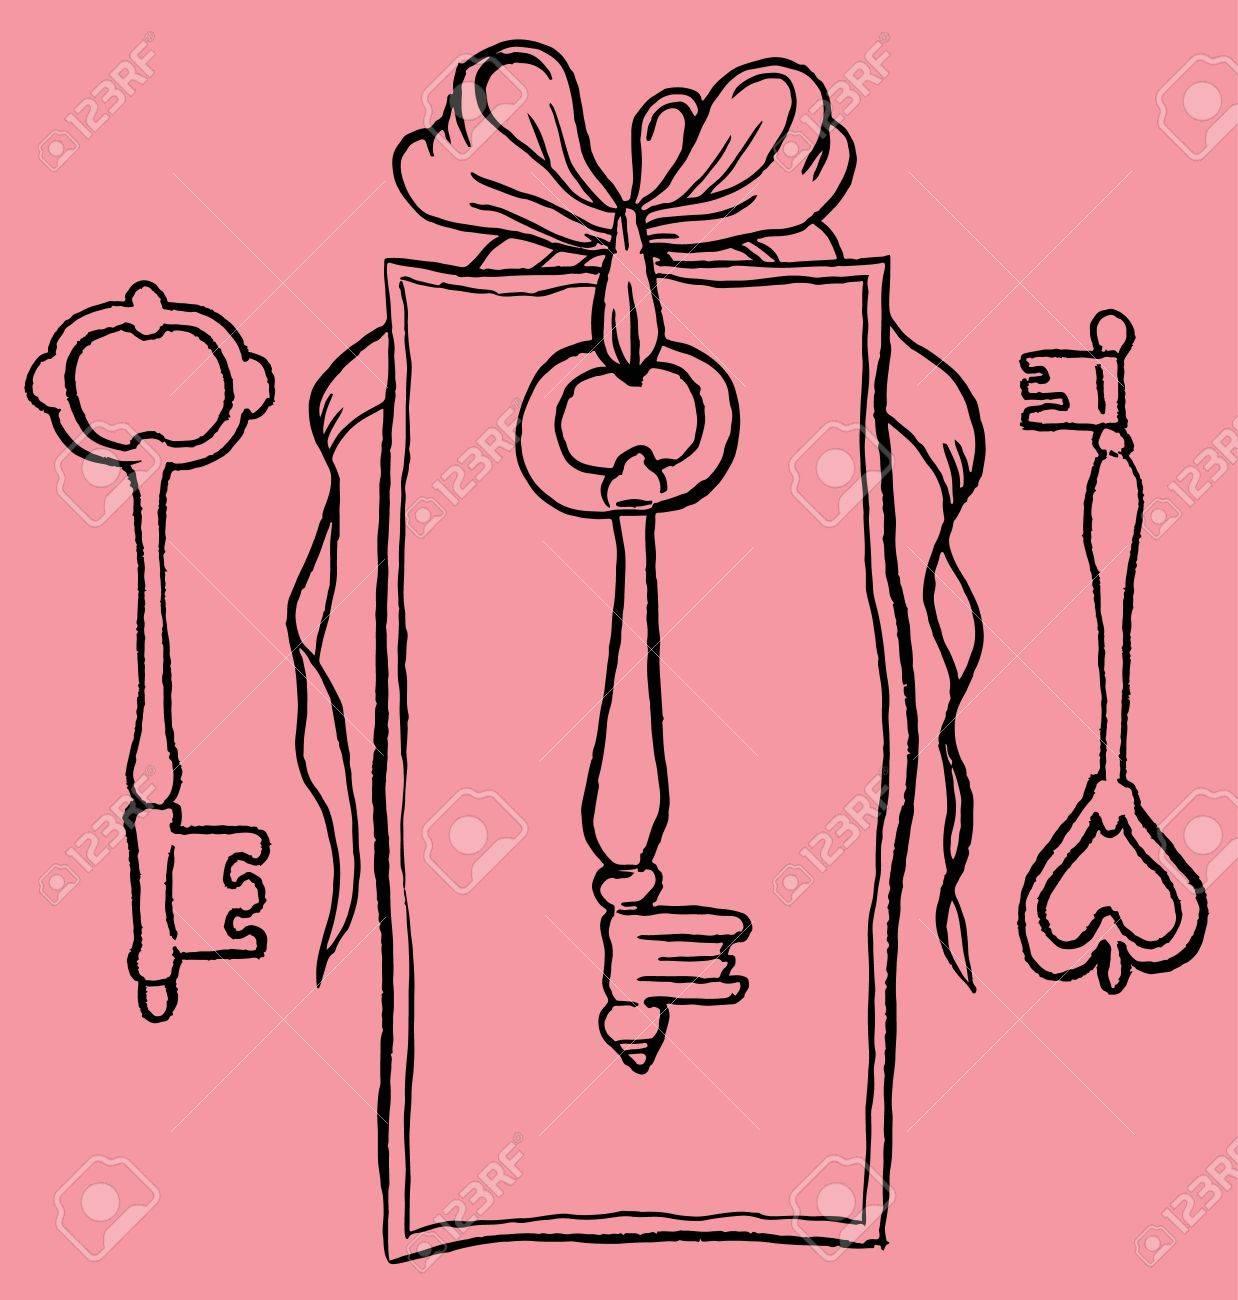 Tag Key Dessin A La Main De Vecteur Clip Art Libres De Droits Vecteurs Et Illustration Image 51389006